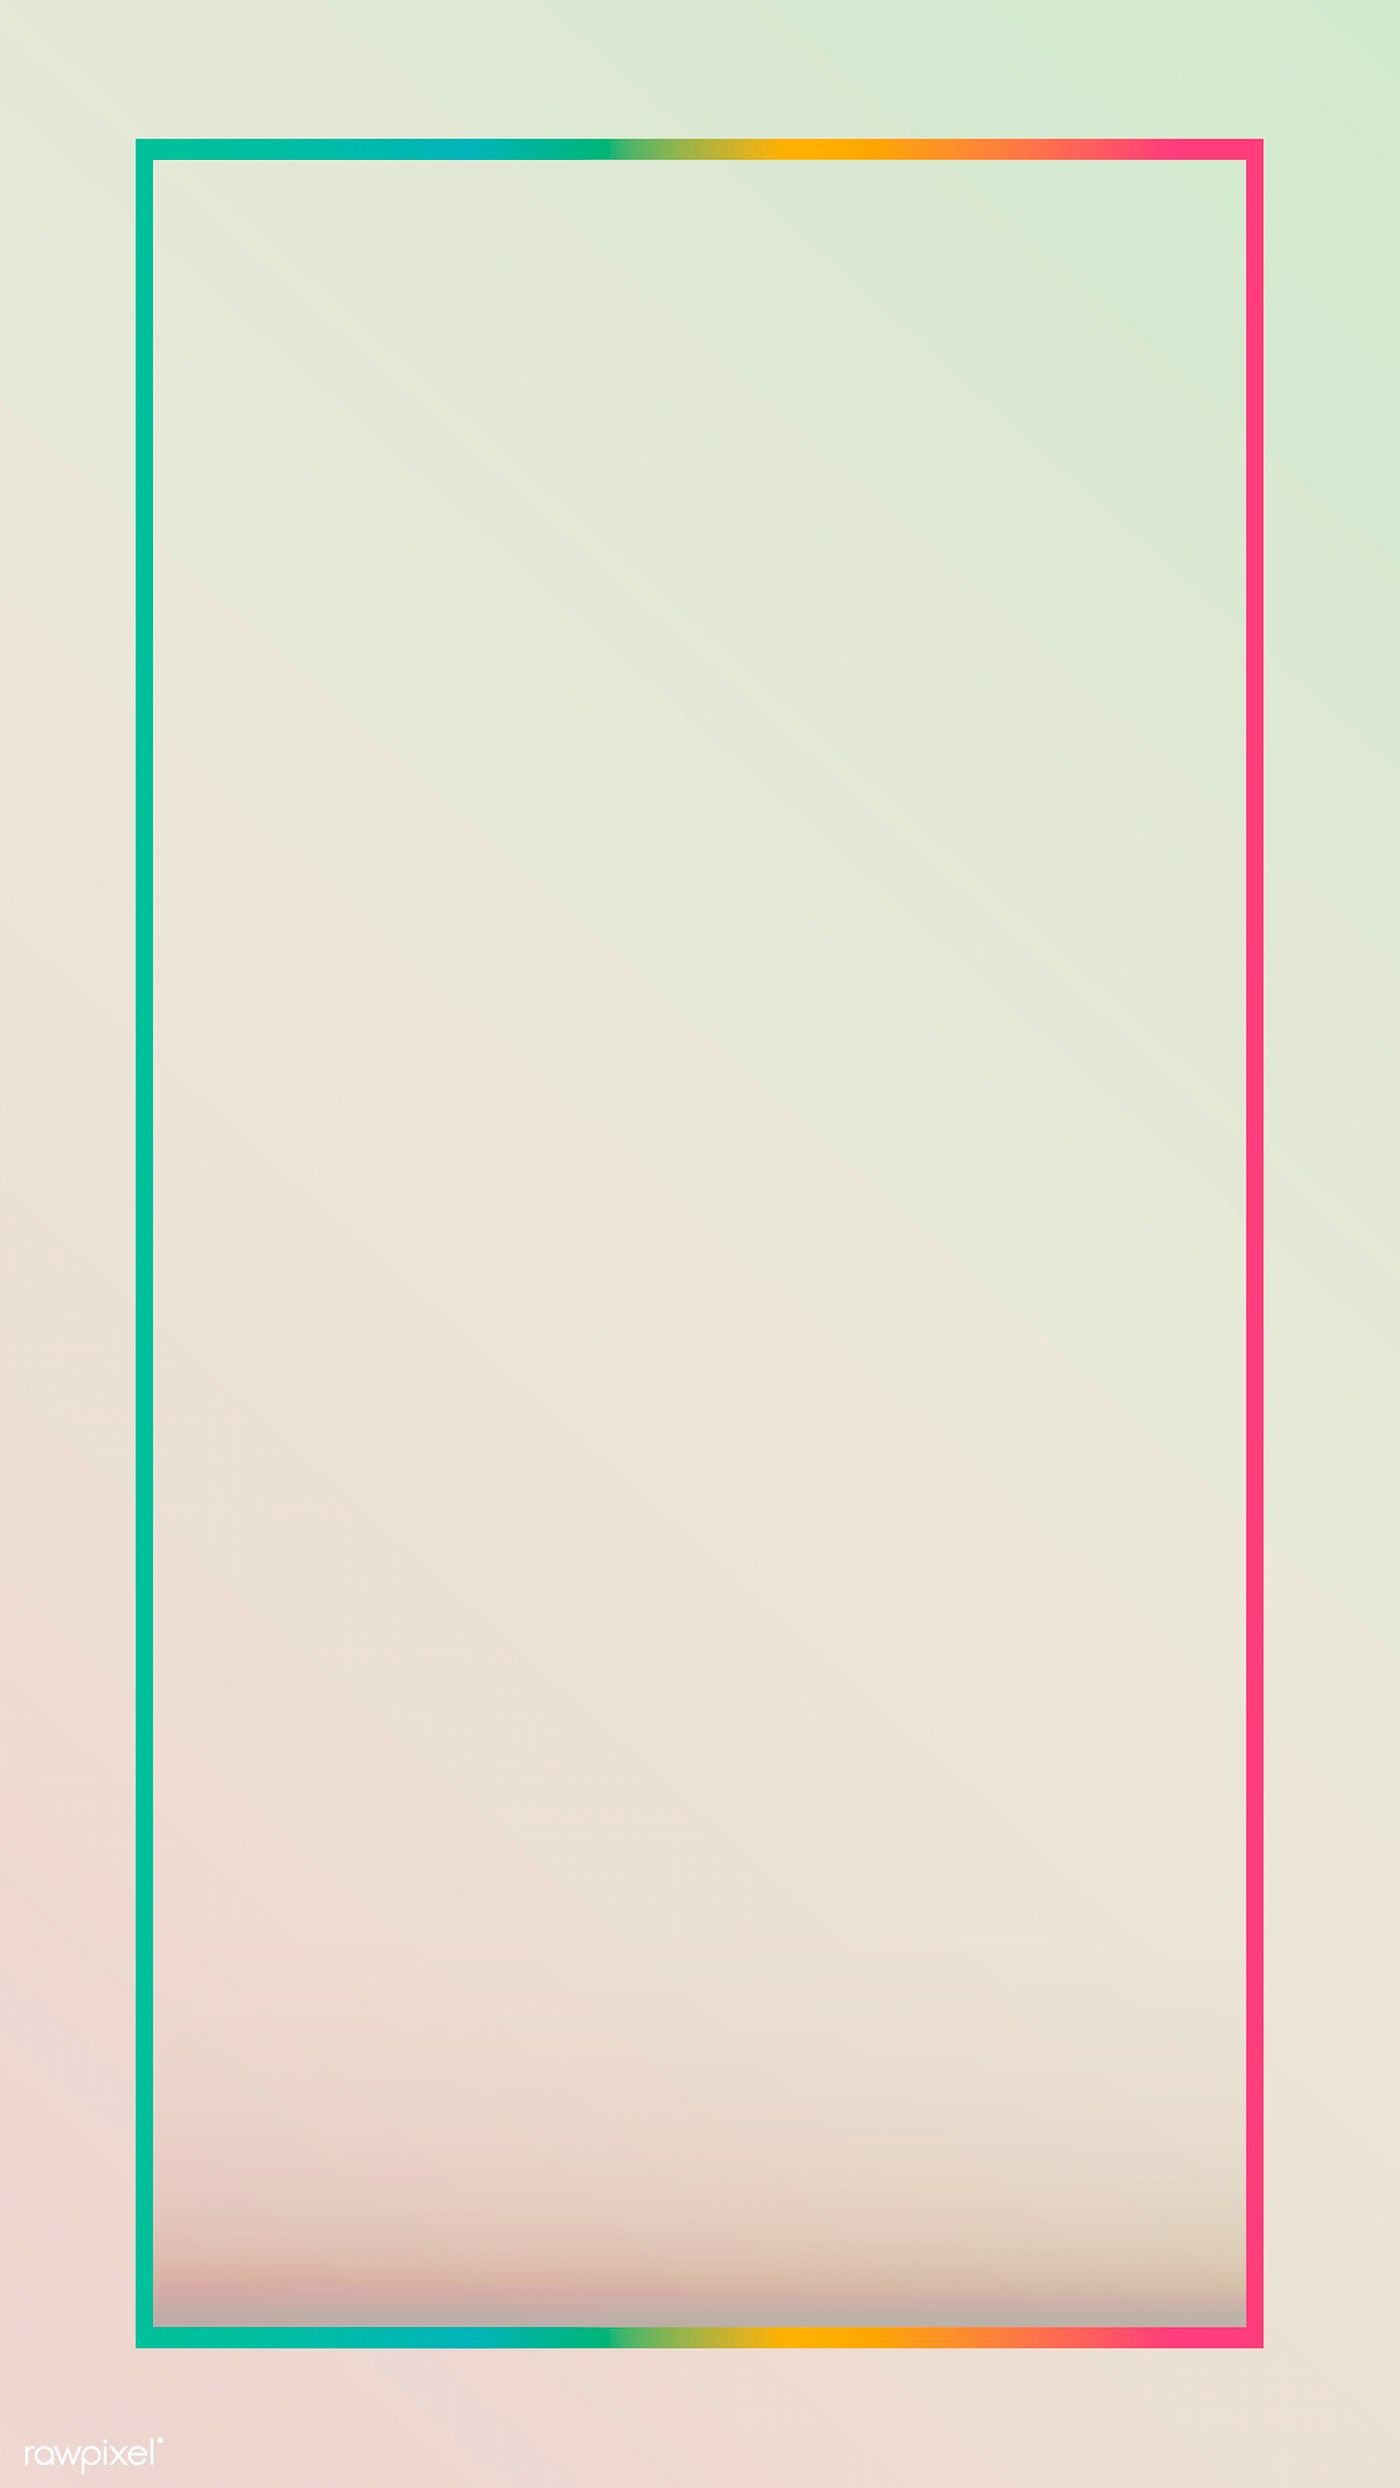 Download Premium Vector Of Gradient Border Mobile Phone Wallpaper Vector Phone Wallpaper Frames Design Graphic Flower Phone Wallpaper